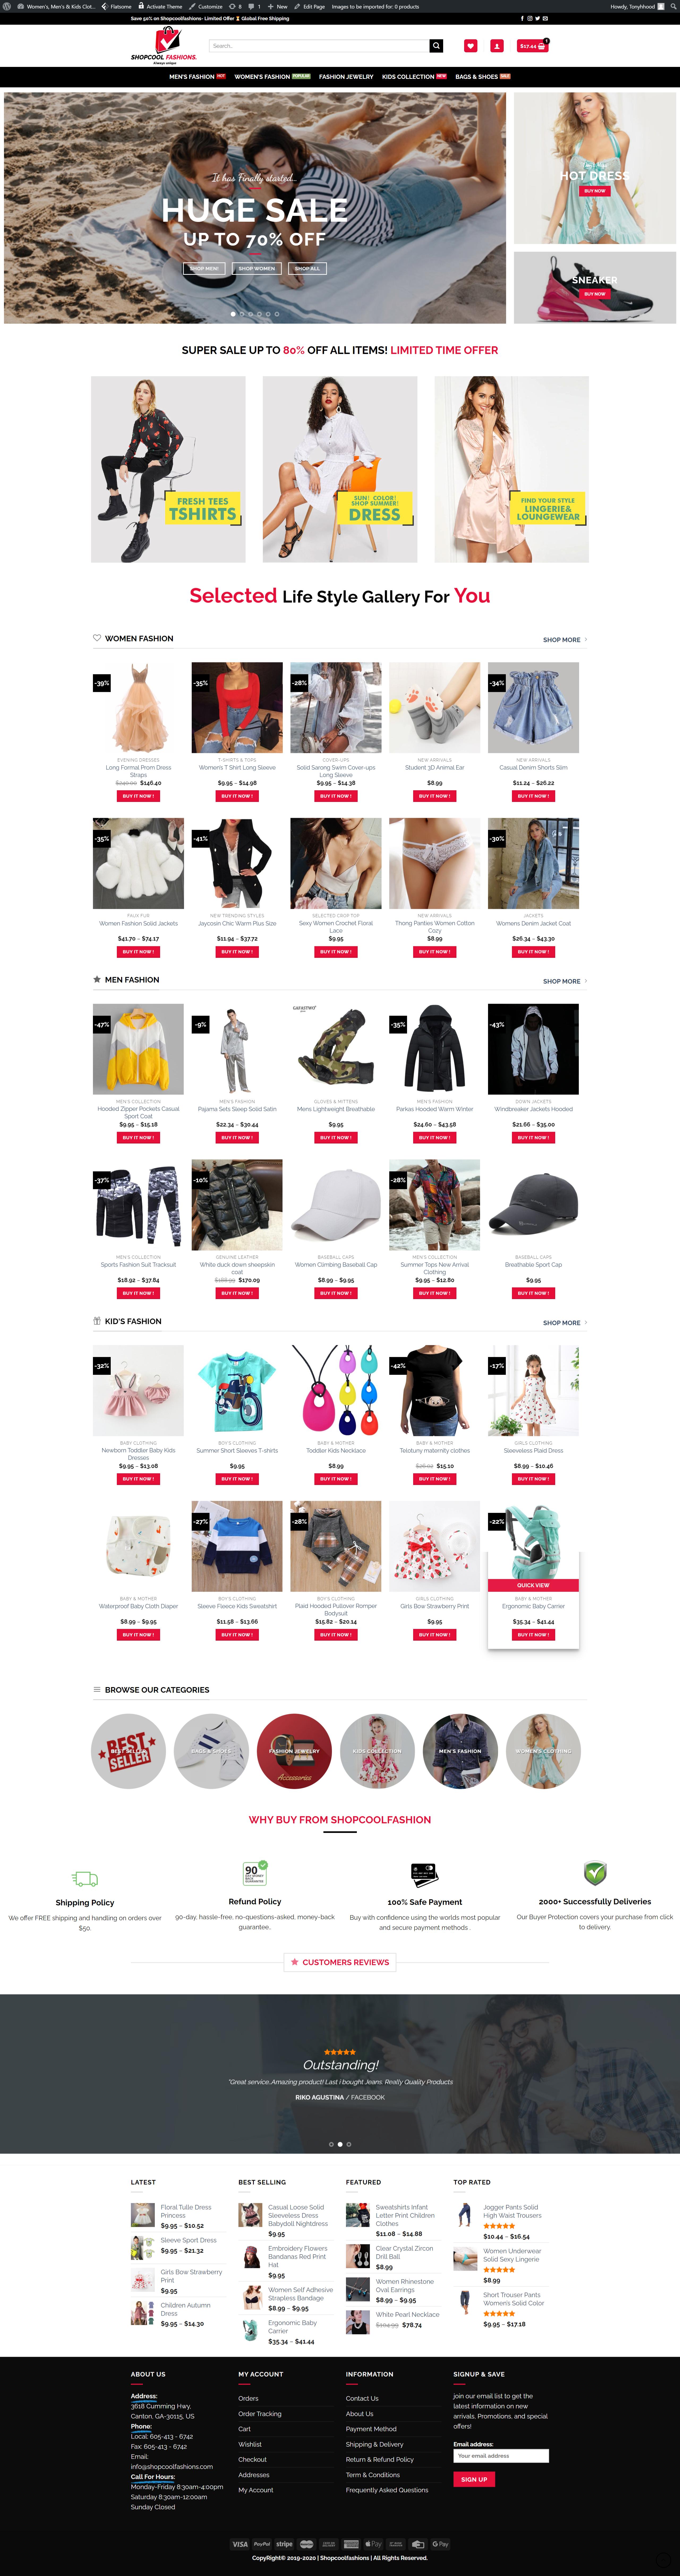 I will build your ecommerce website using wordpress